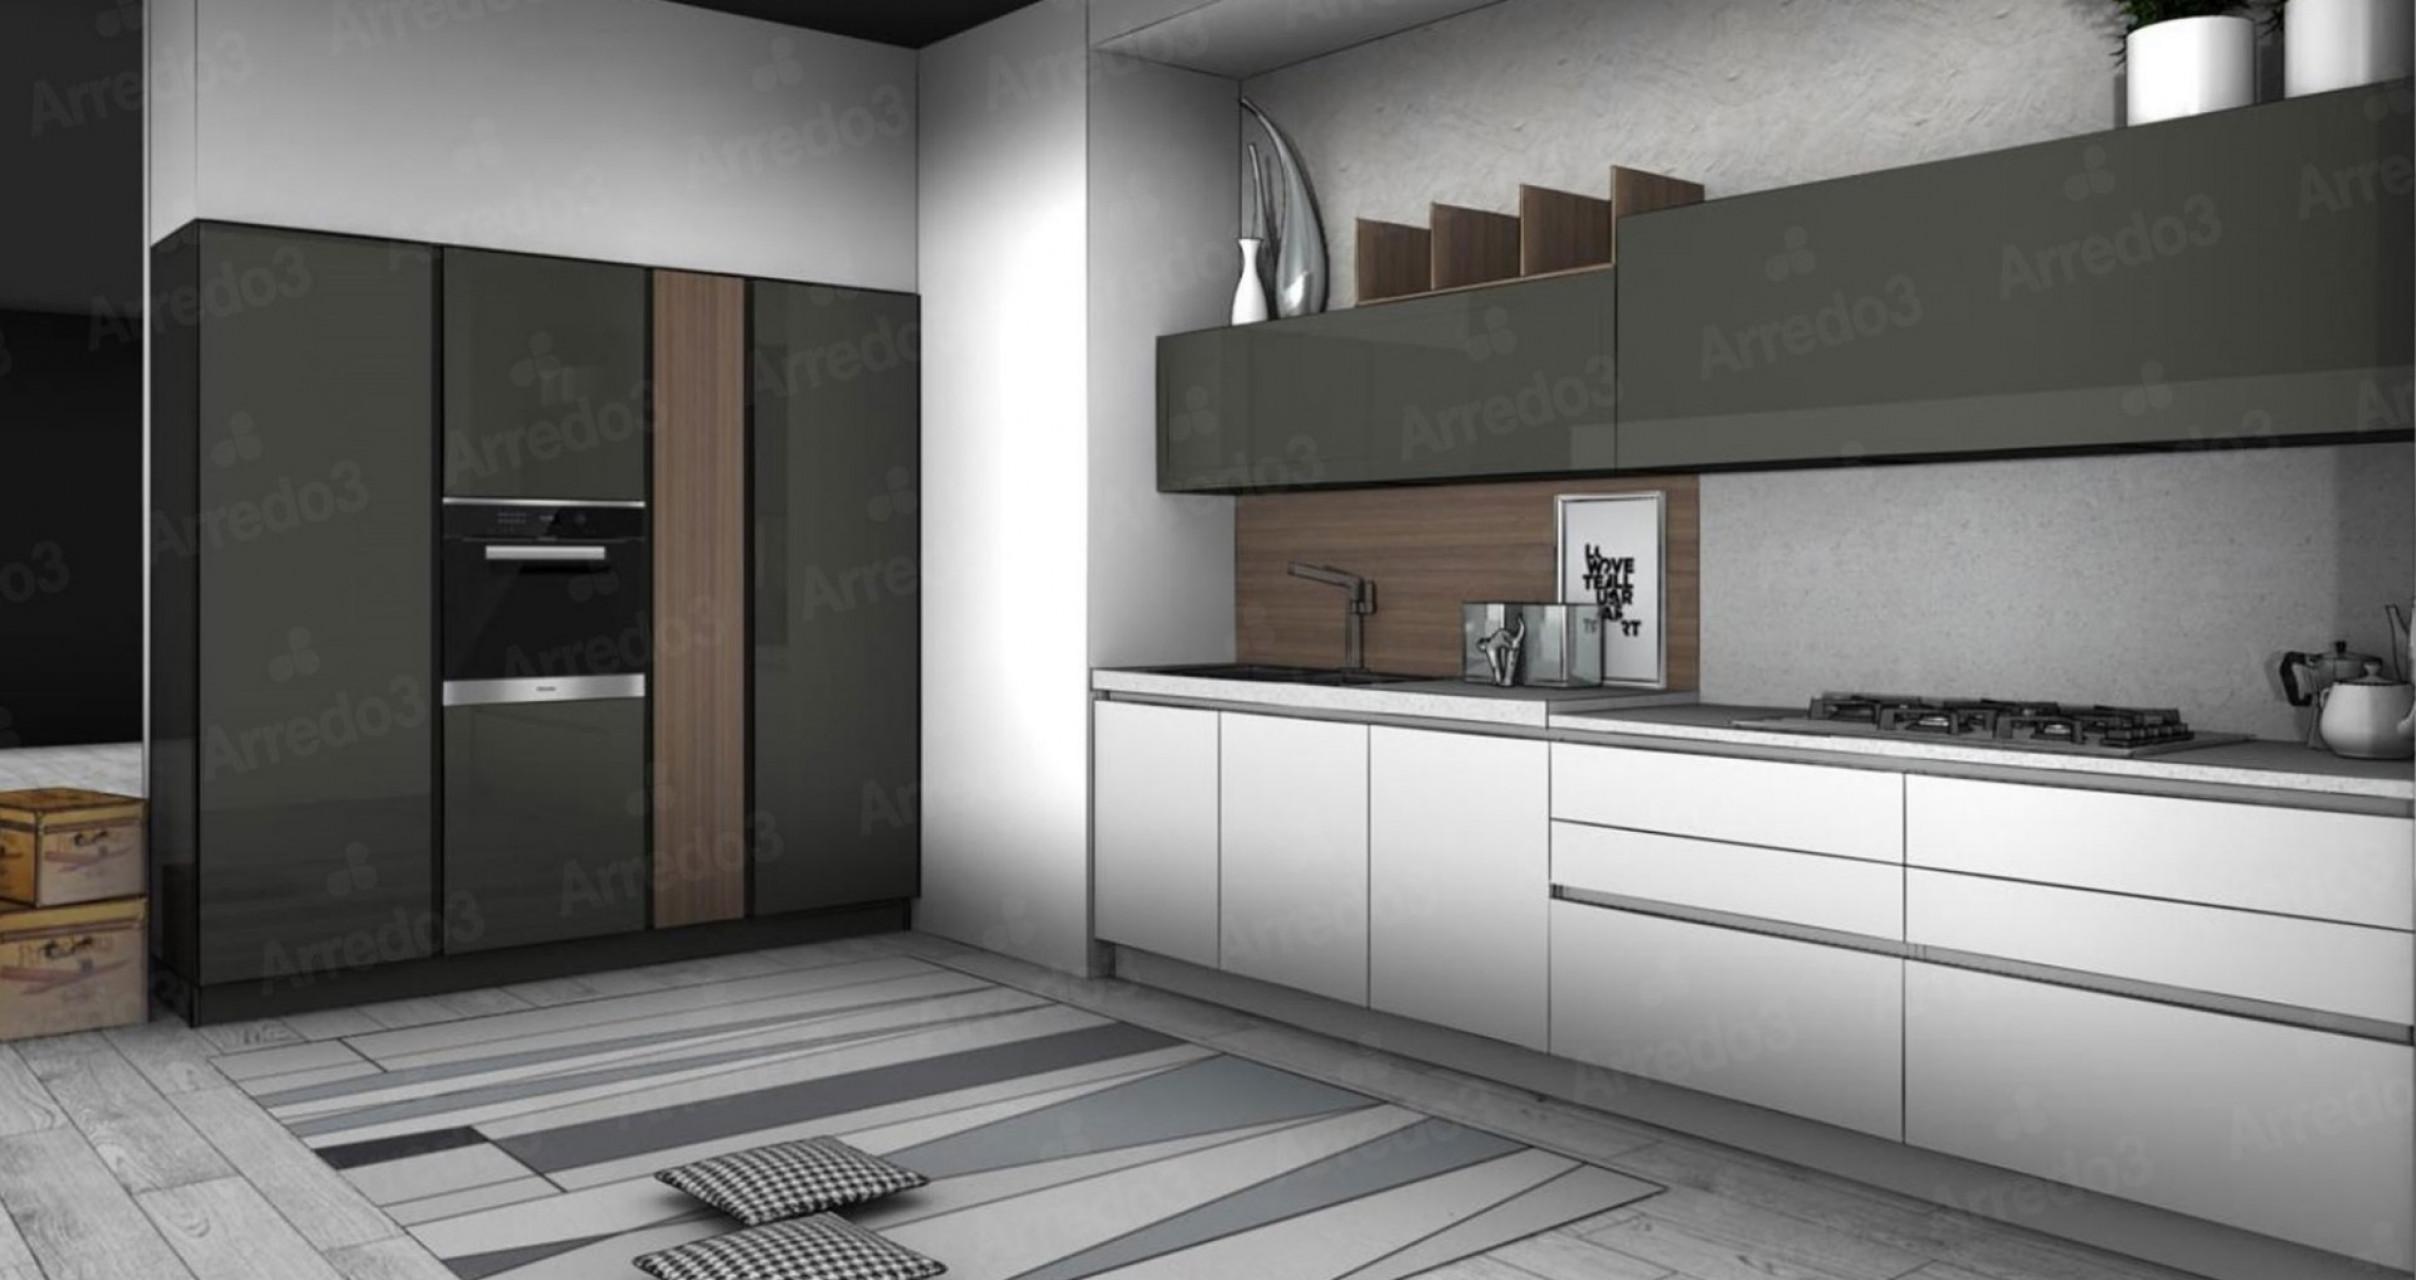 Итальянская Кухня KALI LM13 | Цена на Кухня KALI LM13 ARREDO3